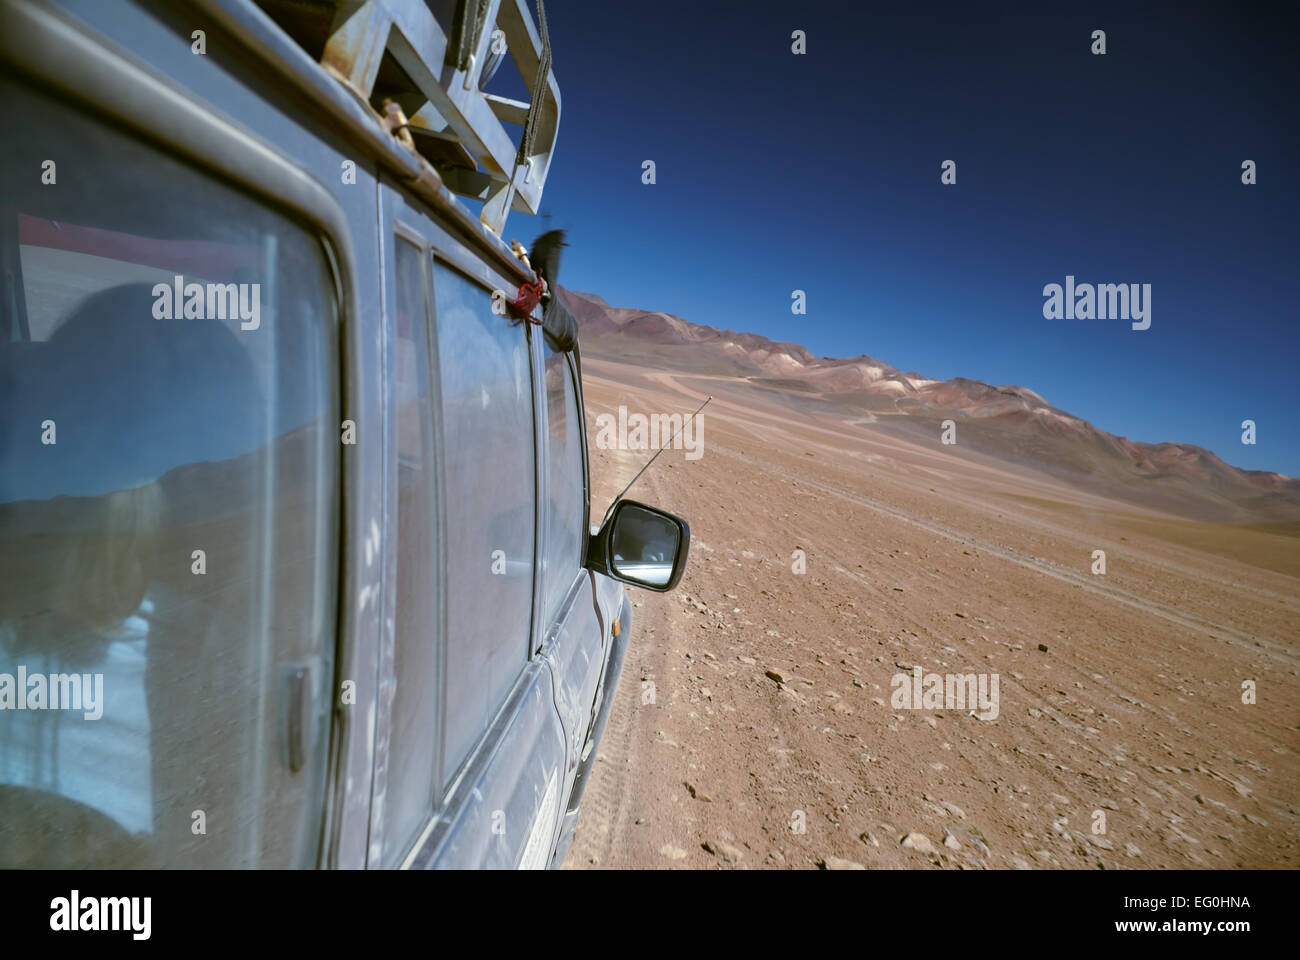 Offroad vehicle crossing bolivian desert near Salar de Uyuni - Stock Image